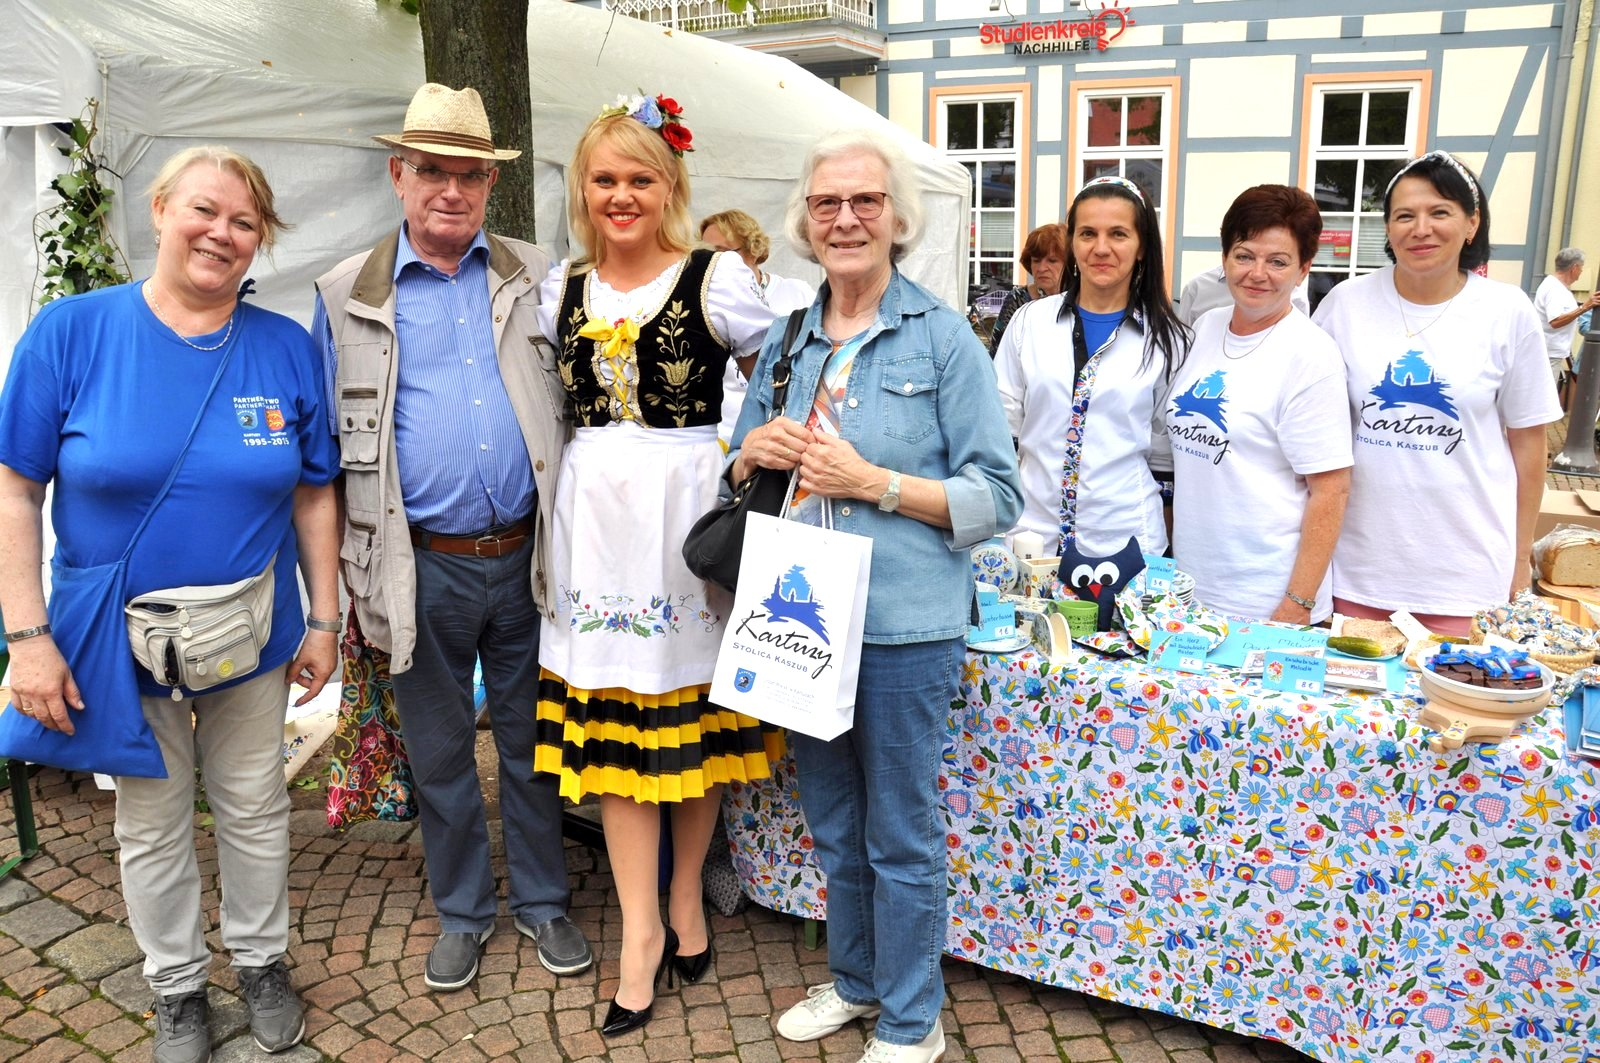 25-lecie partnerstwa gminy Kartuzy i miasta Duderstadt 2